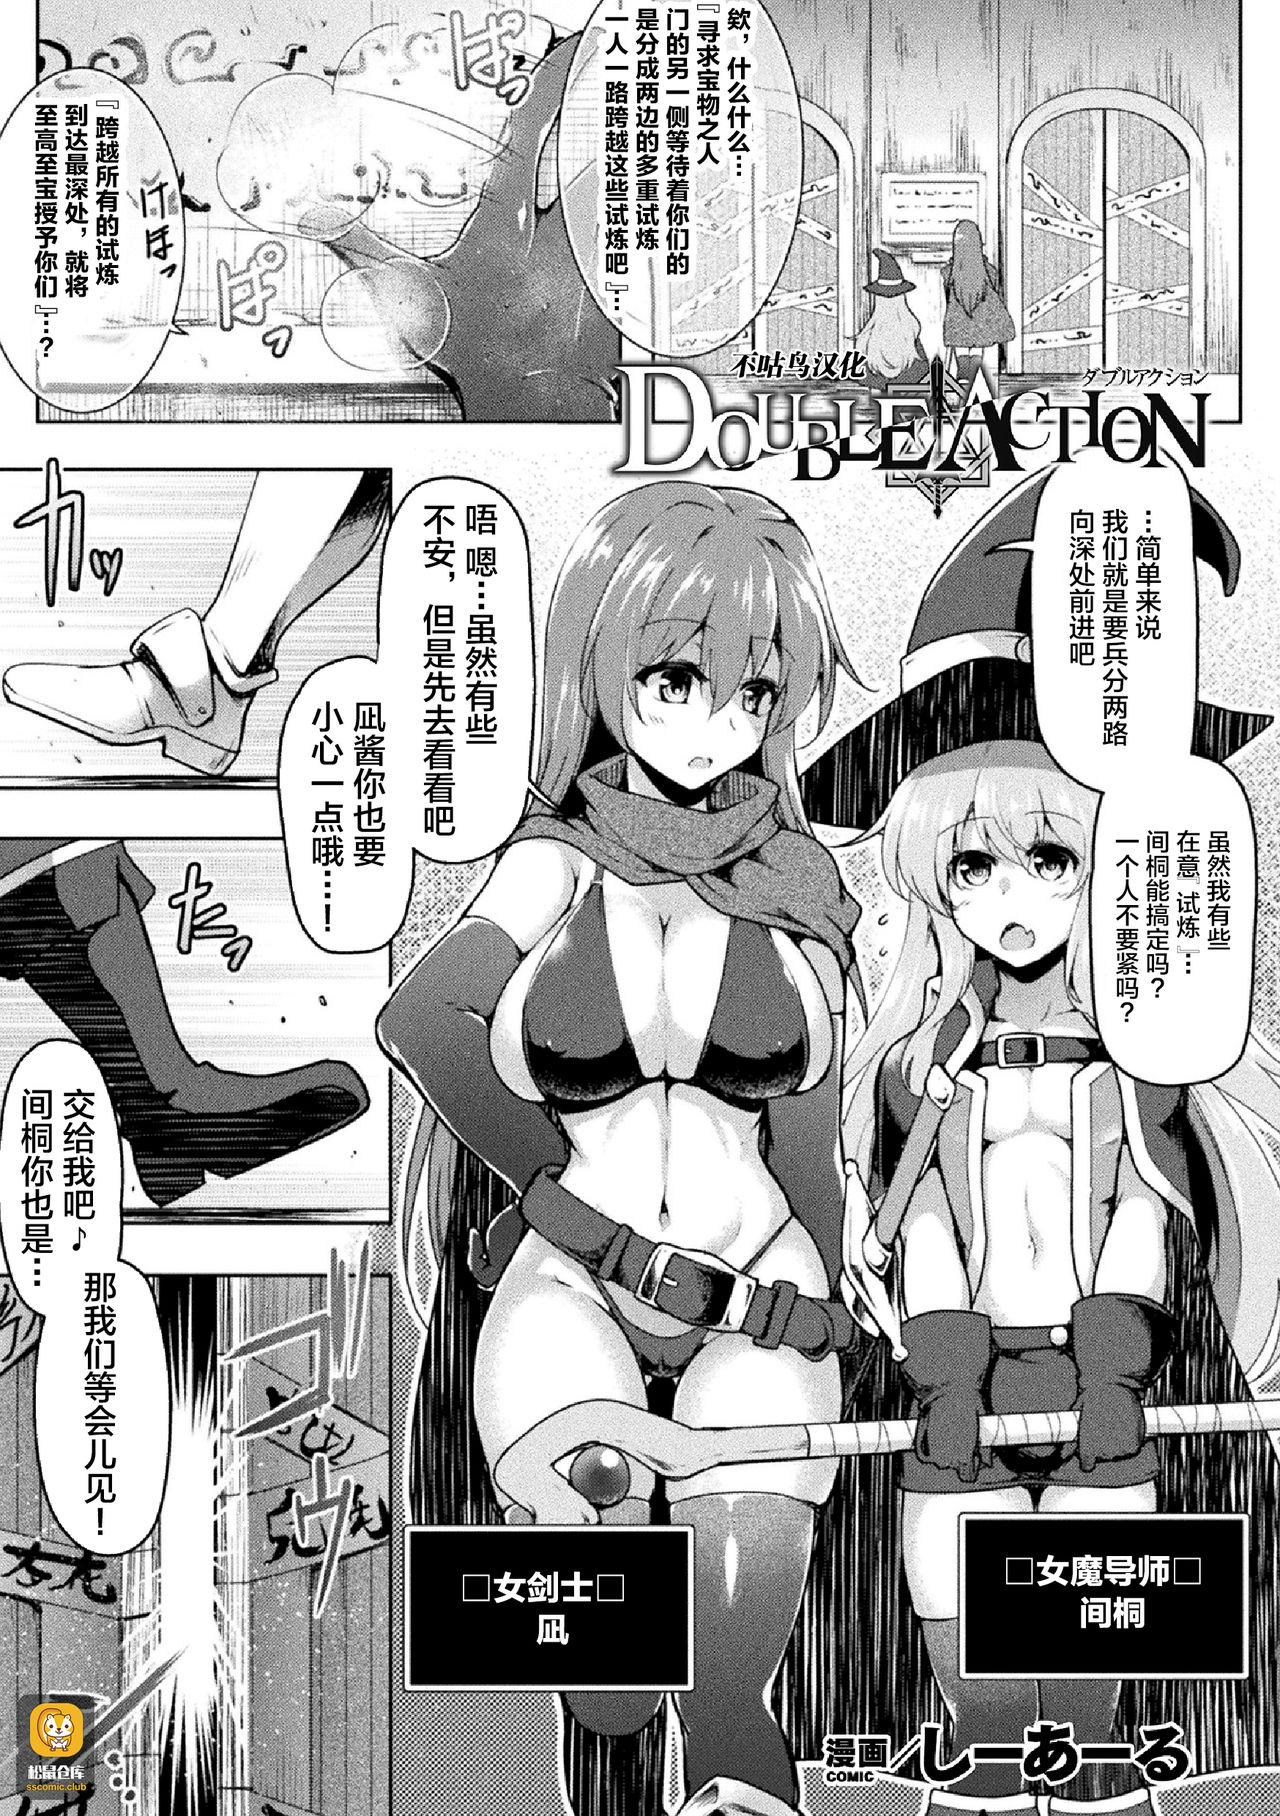 2D Comic Magazine Zecchou Kairaku ga Tomaranai Ero-Trap Dungeon Vol. 2 64